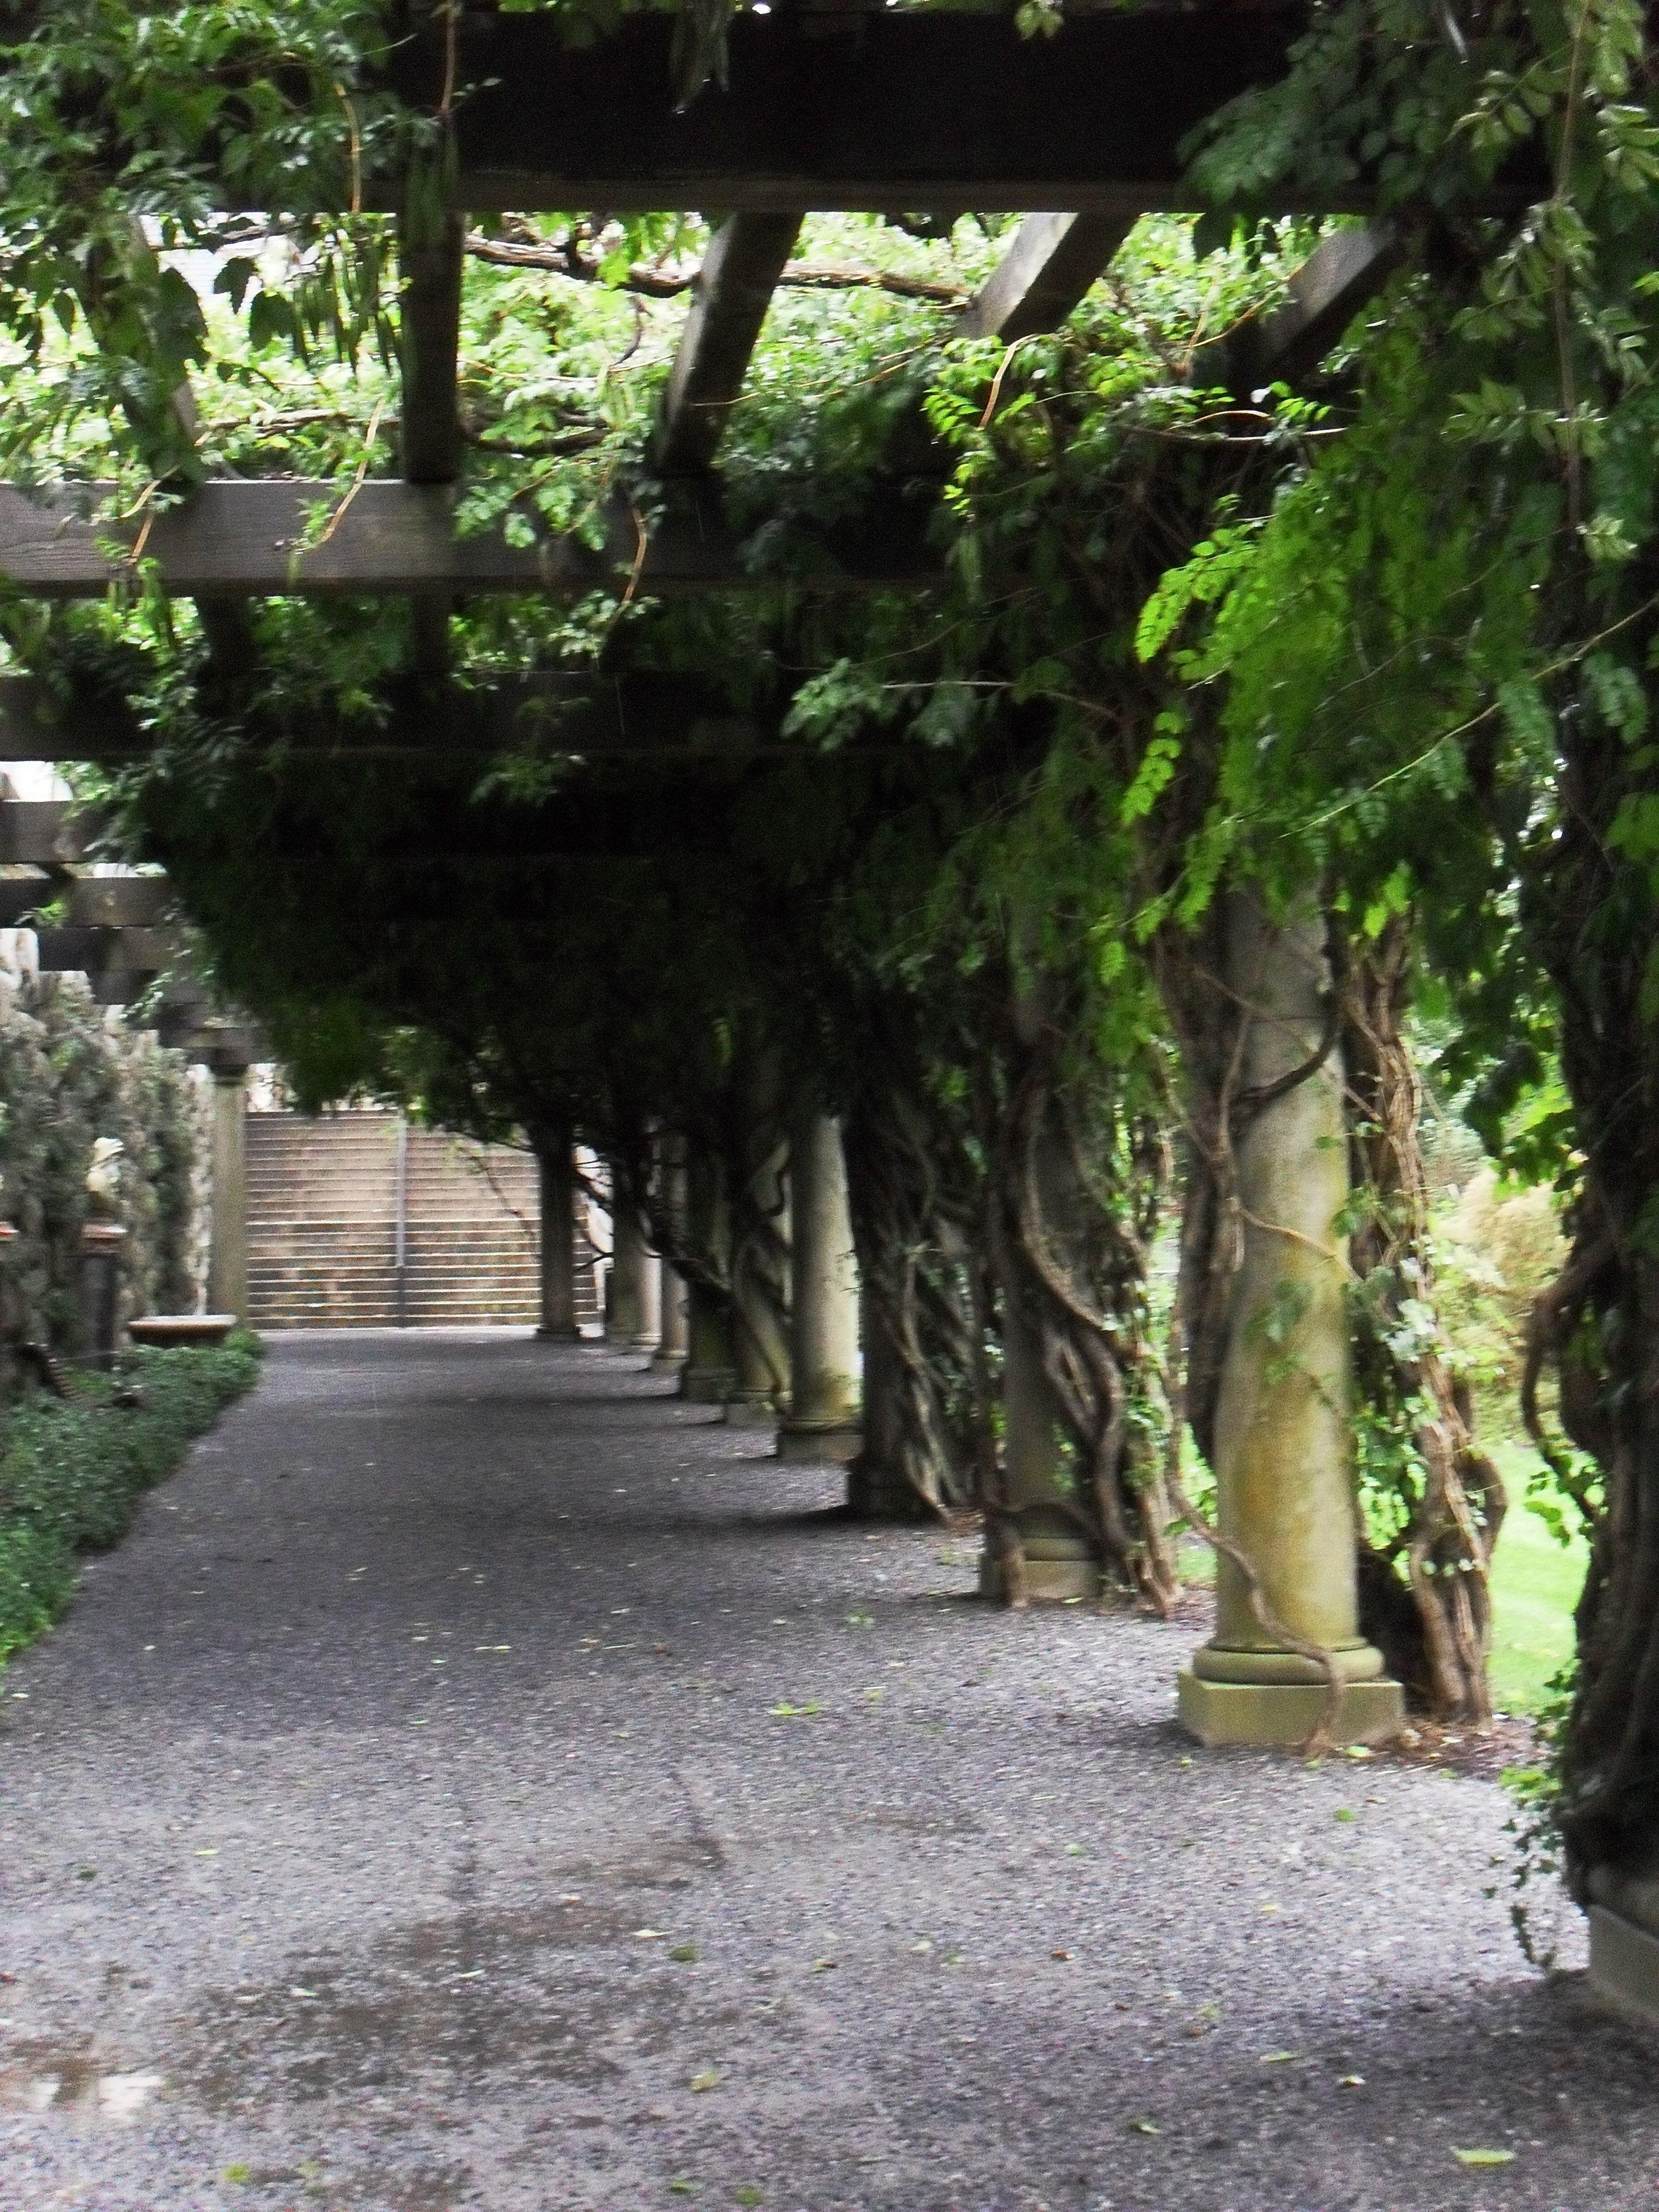 Massive Wisteria Vines Are Trellised Biltmore House